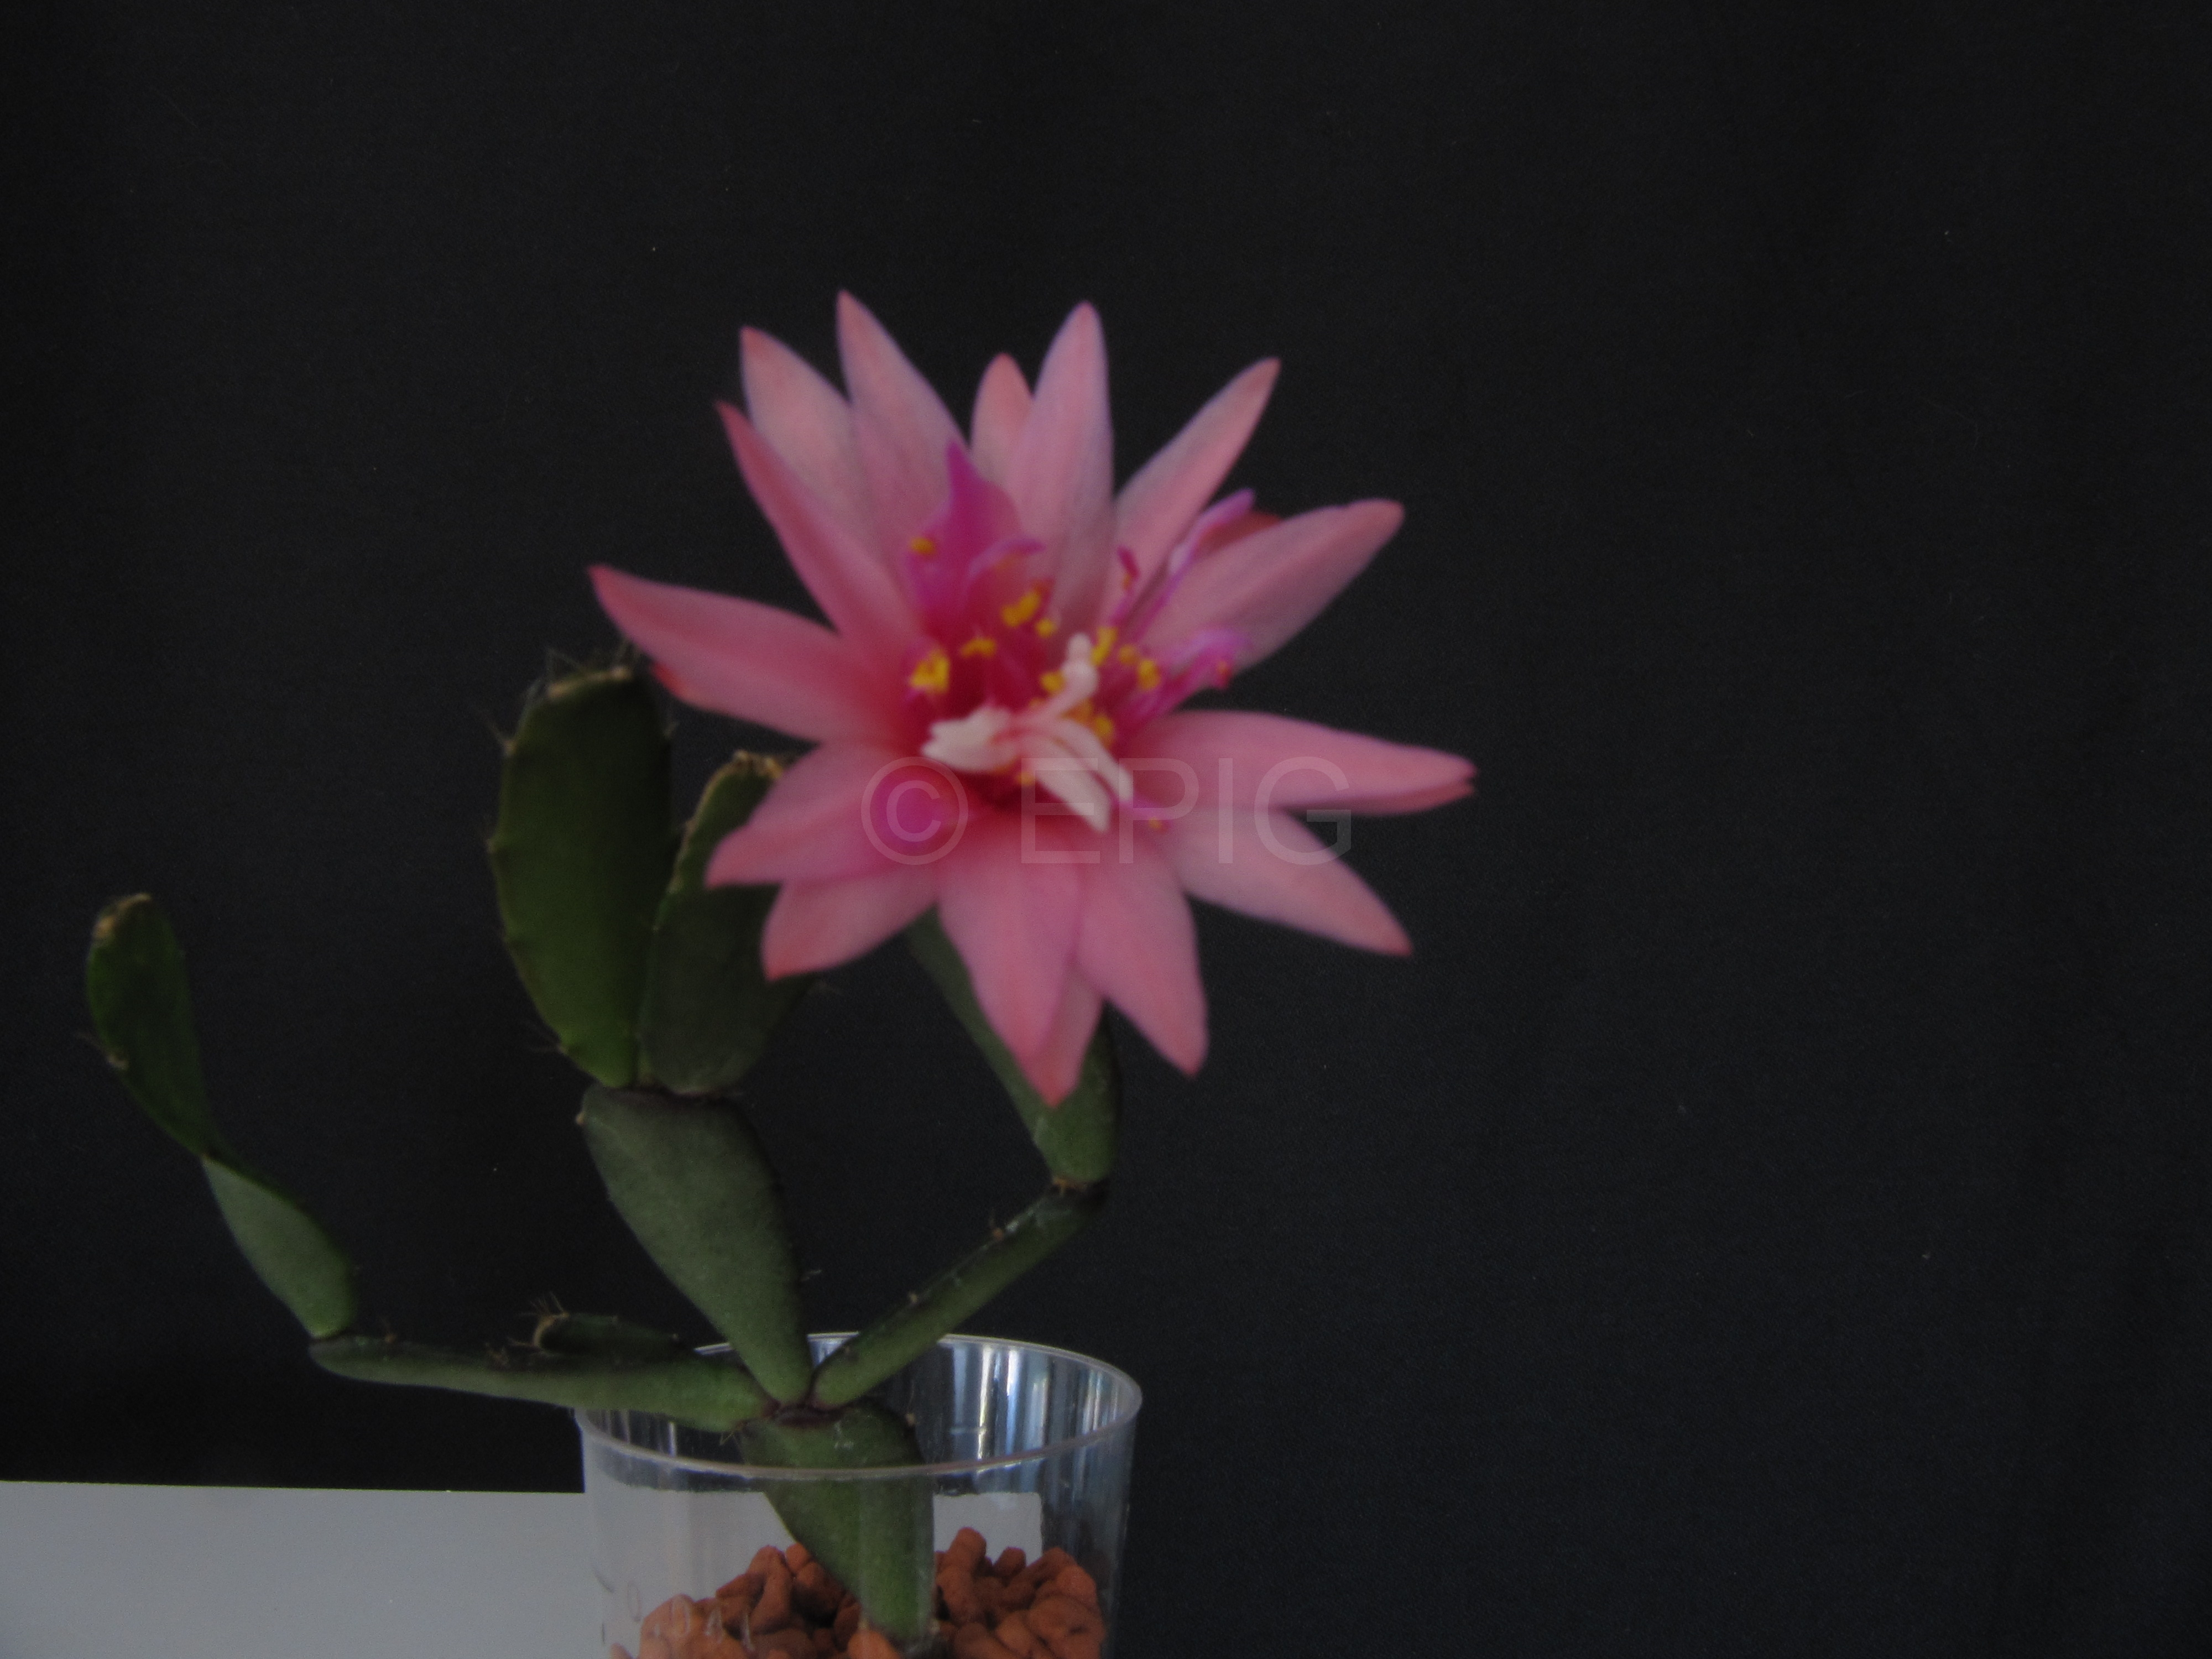 Rhipsalidopsis x graeseri 'Flore Pleno' (Foto Horst Kündiger)